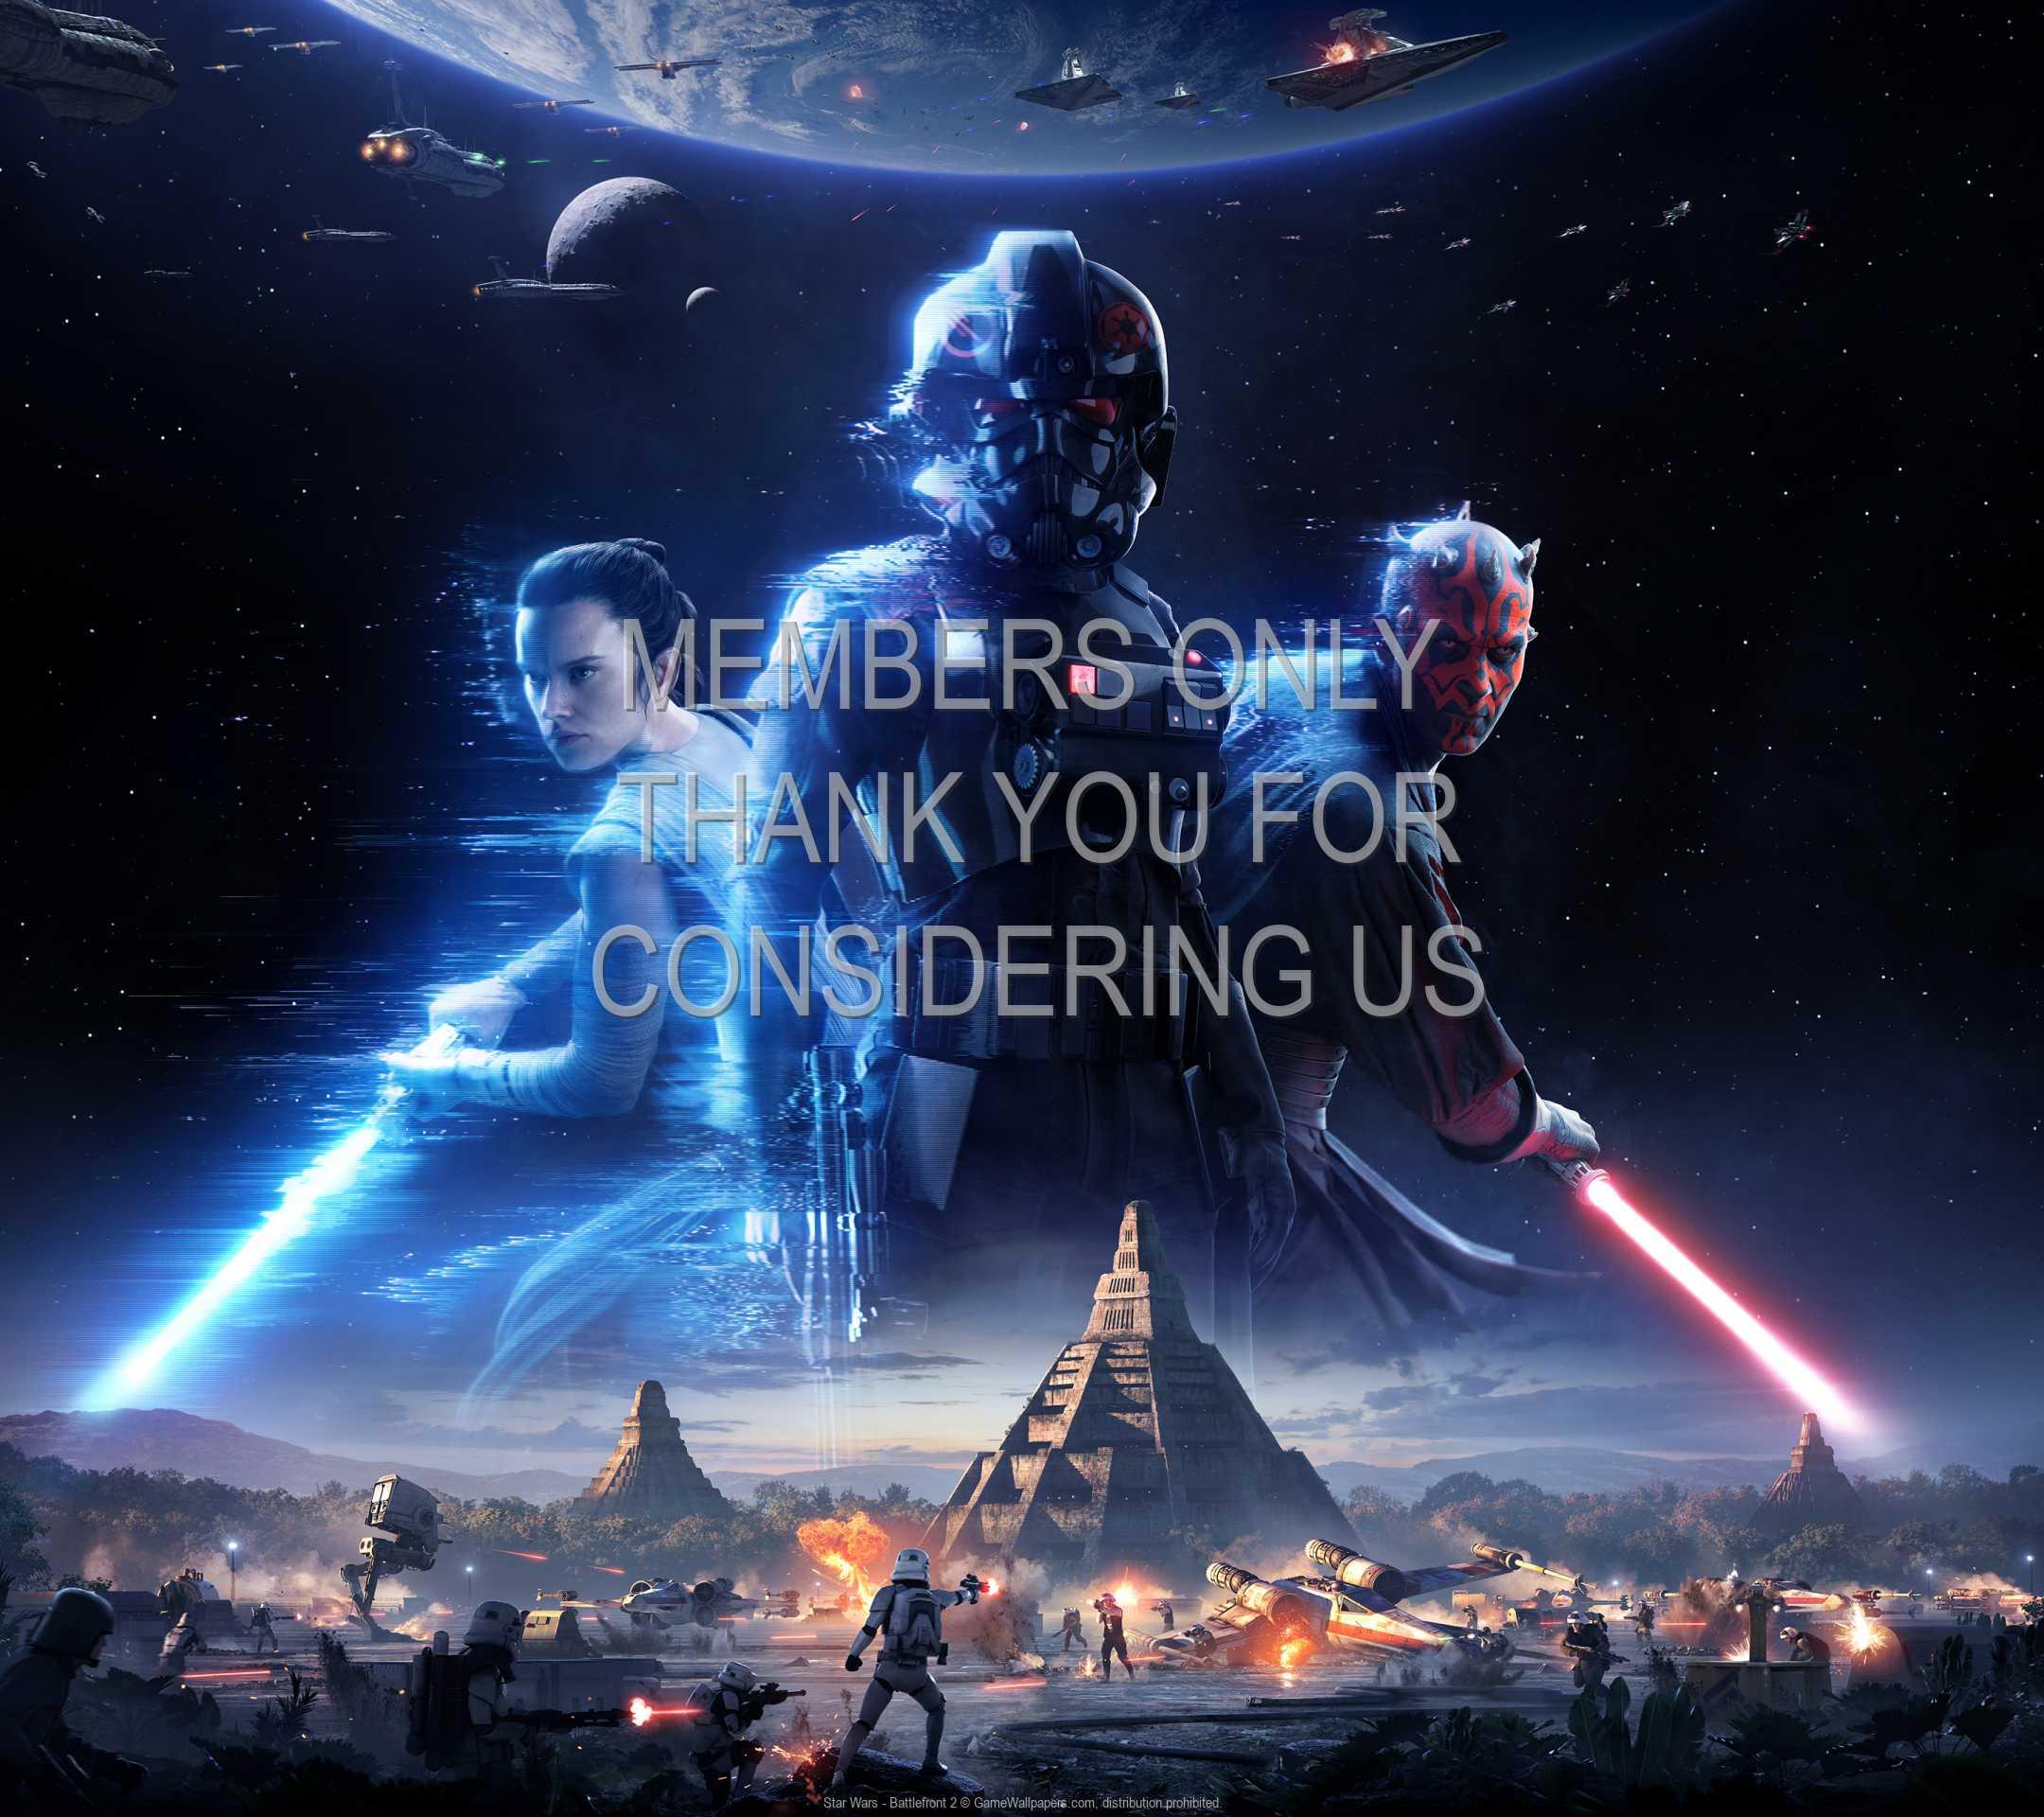 Star Wars - Battlefront 2 1080p Horizontal Móvil fondo de escritorio 01